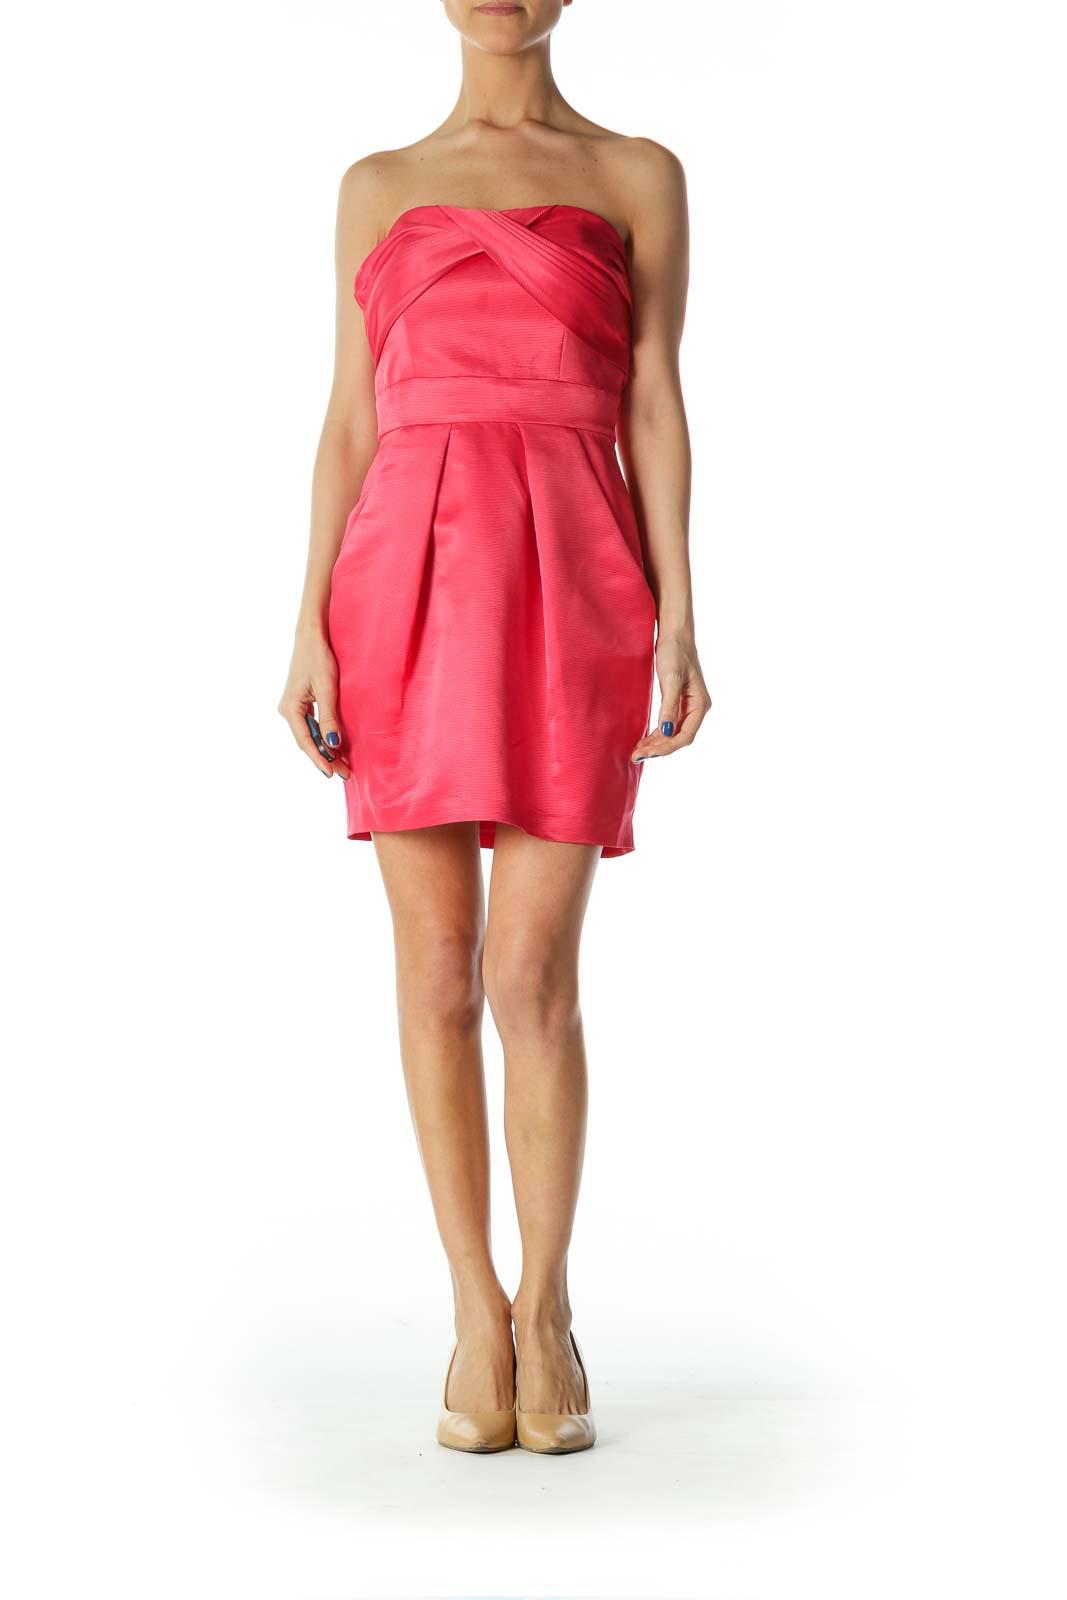 Pink Textured Strapless Cocktail Dress